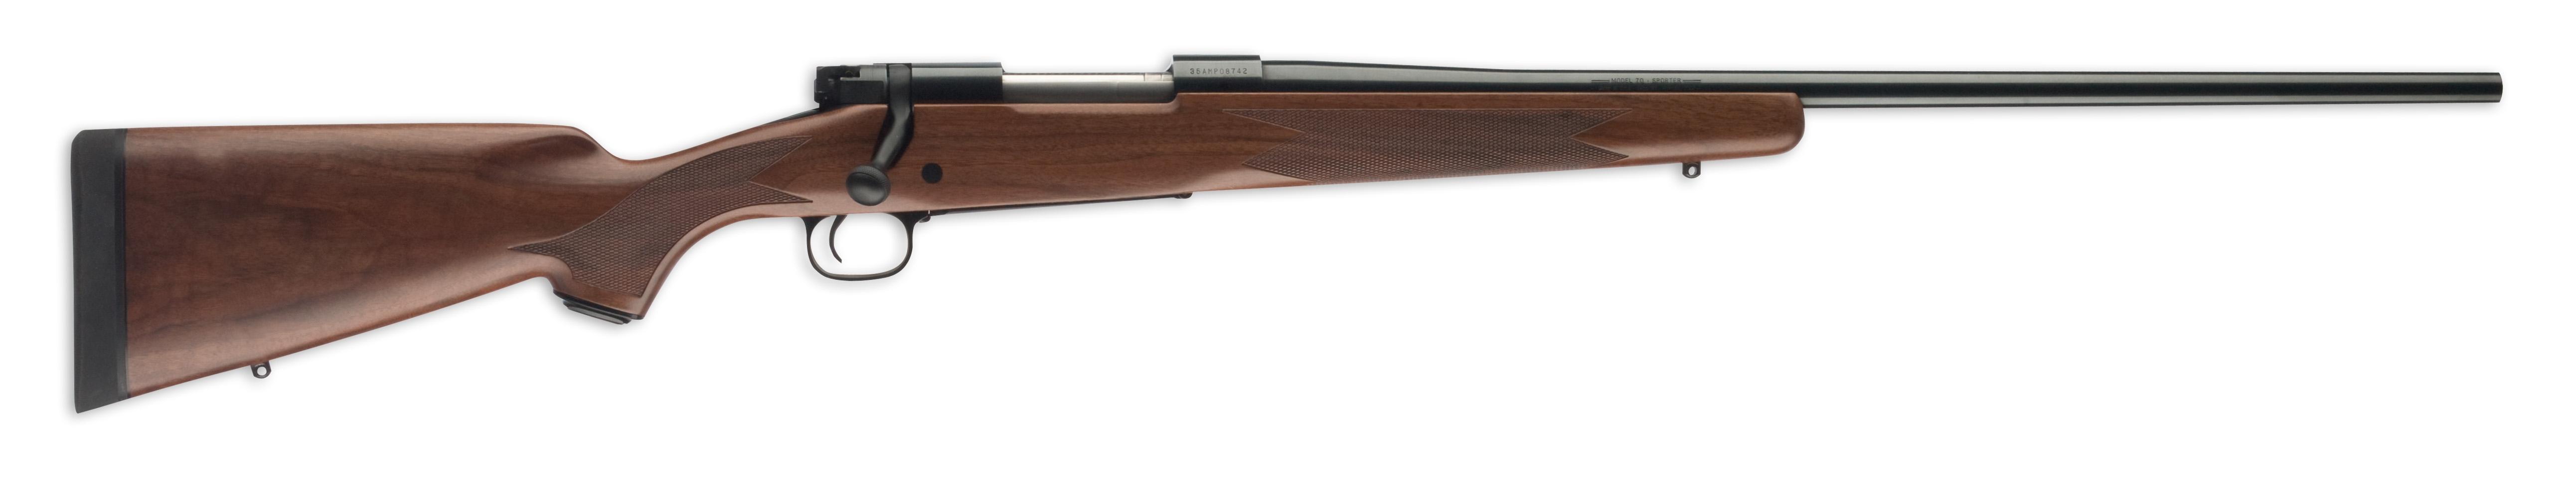 Winchester Model 70 Sporter 300 Win Mag